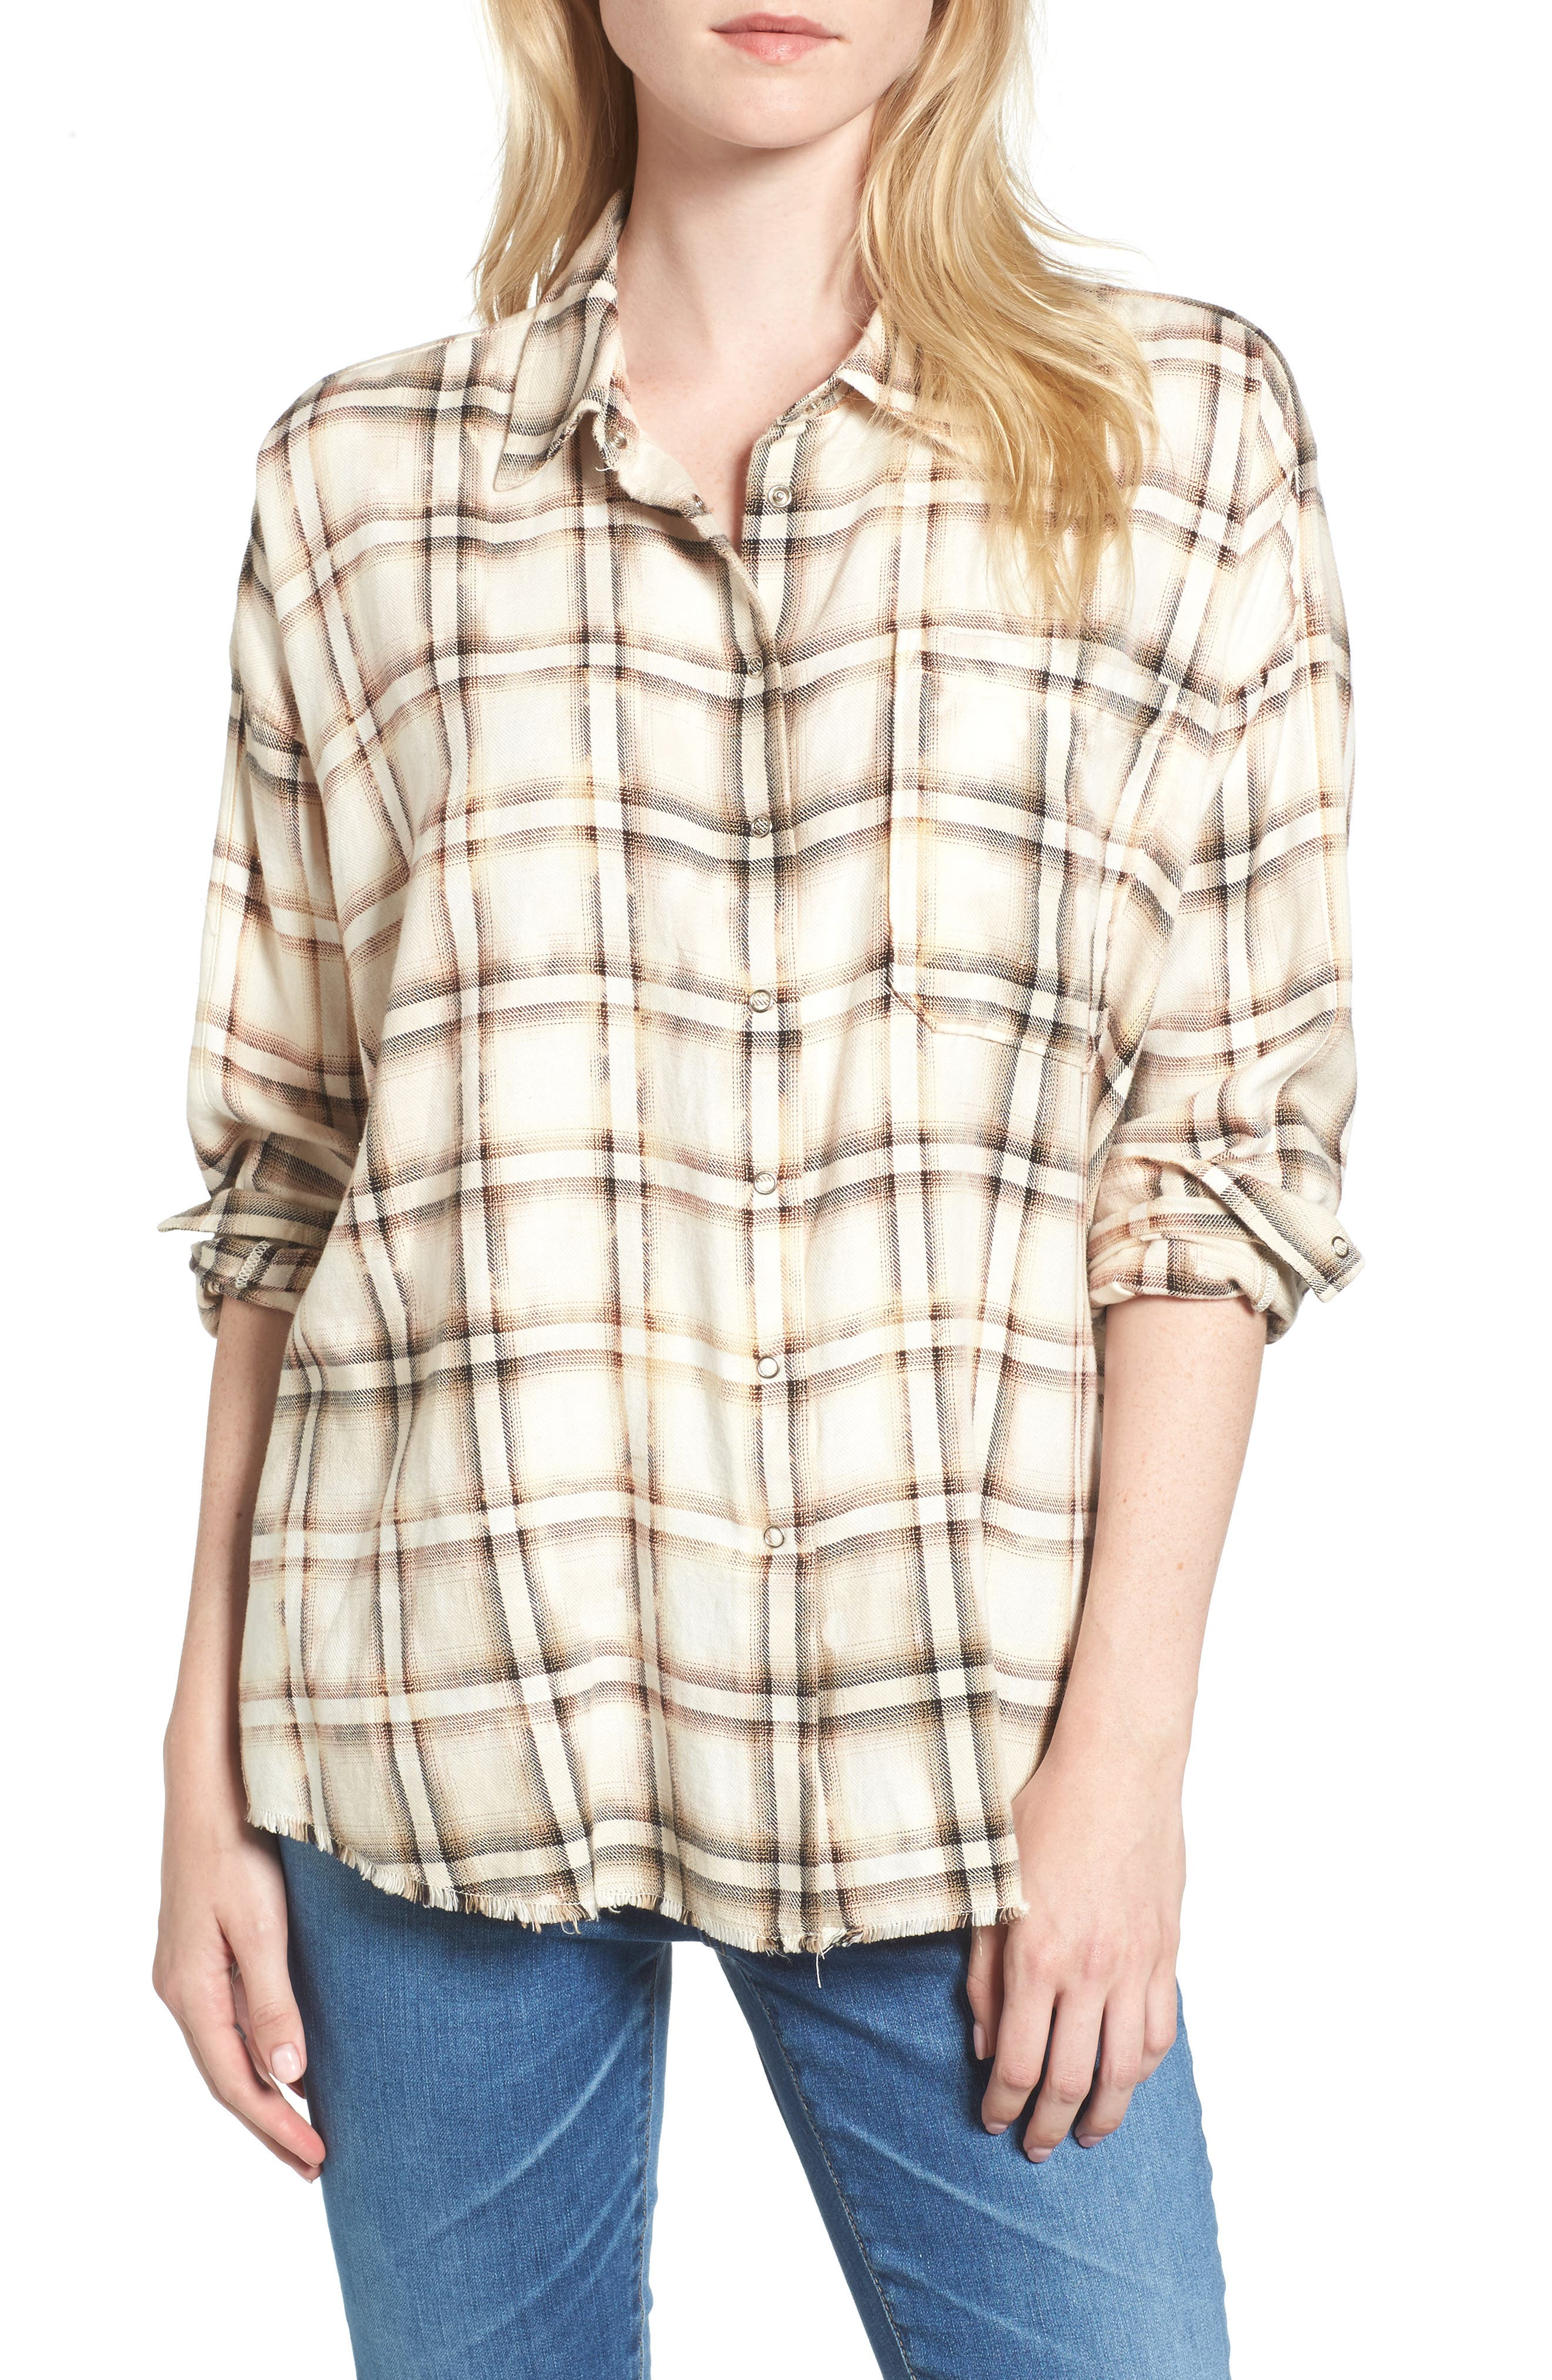 Josie Flannel Shirt,                             Main thumbnail 1, color,                             909